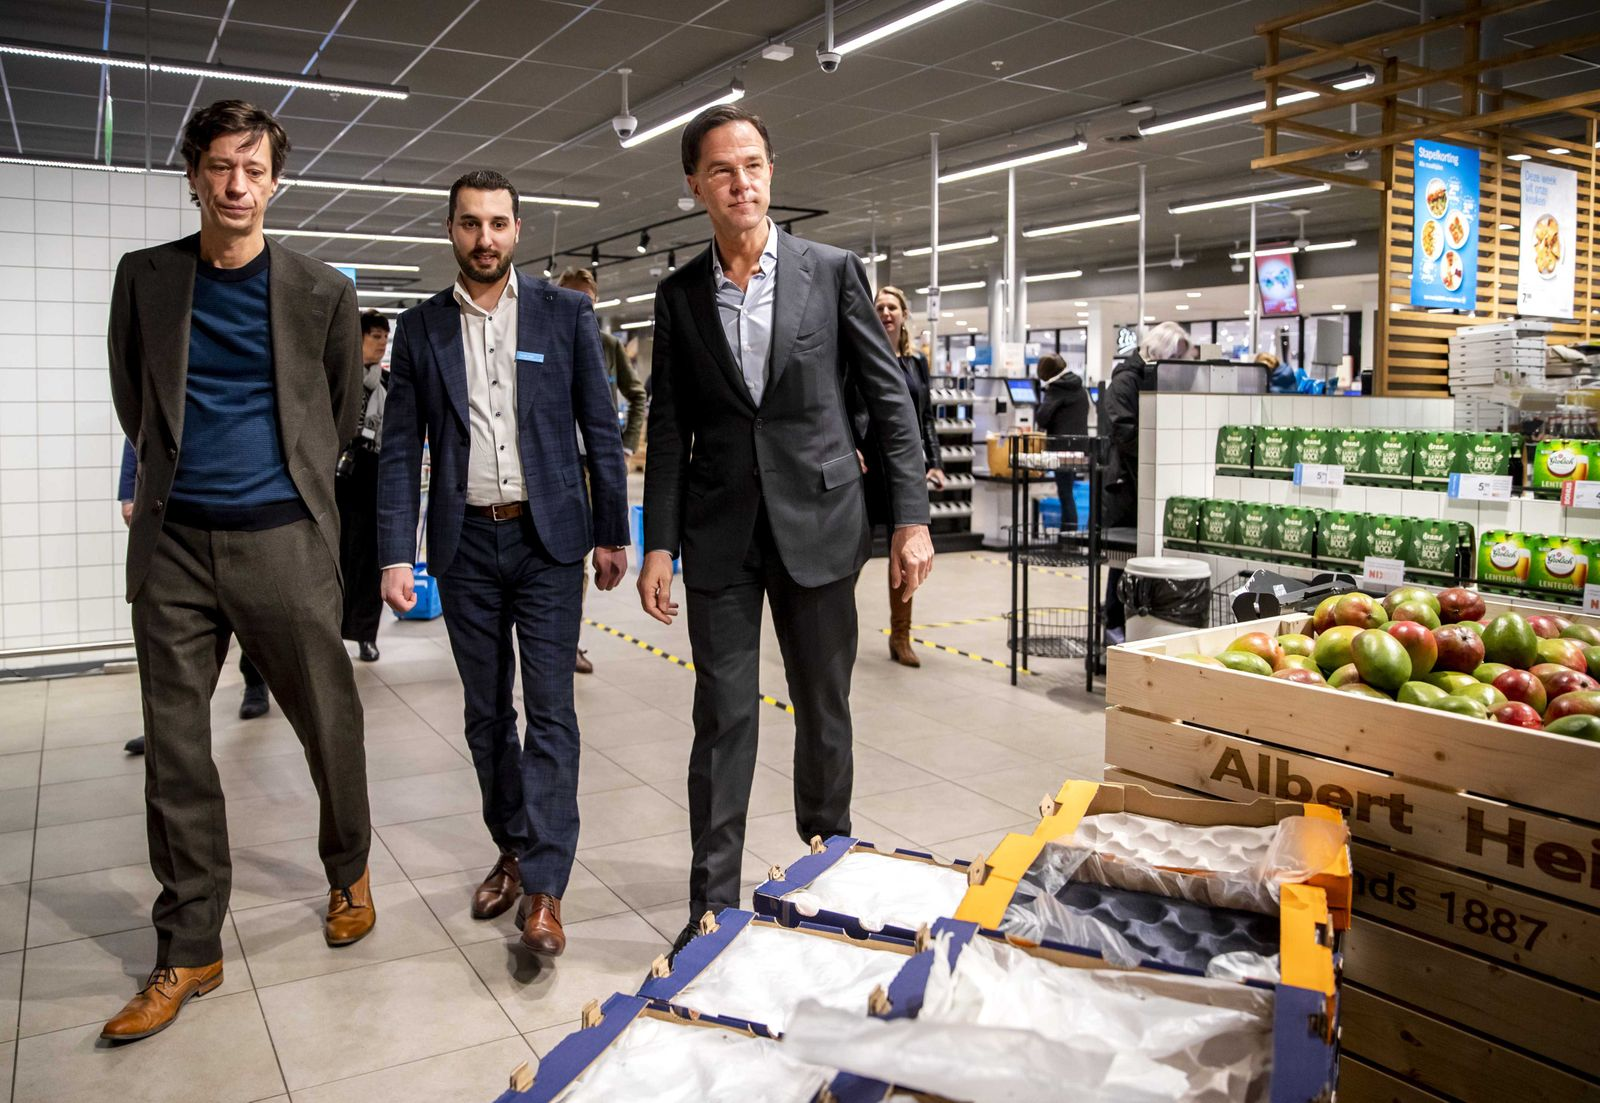 Dutch Prime Minister Mark Rutte visits a grocery store, Den Haag, Netherlands - 19 Mar 2020